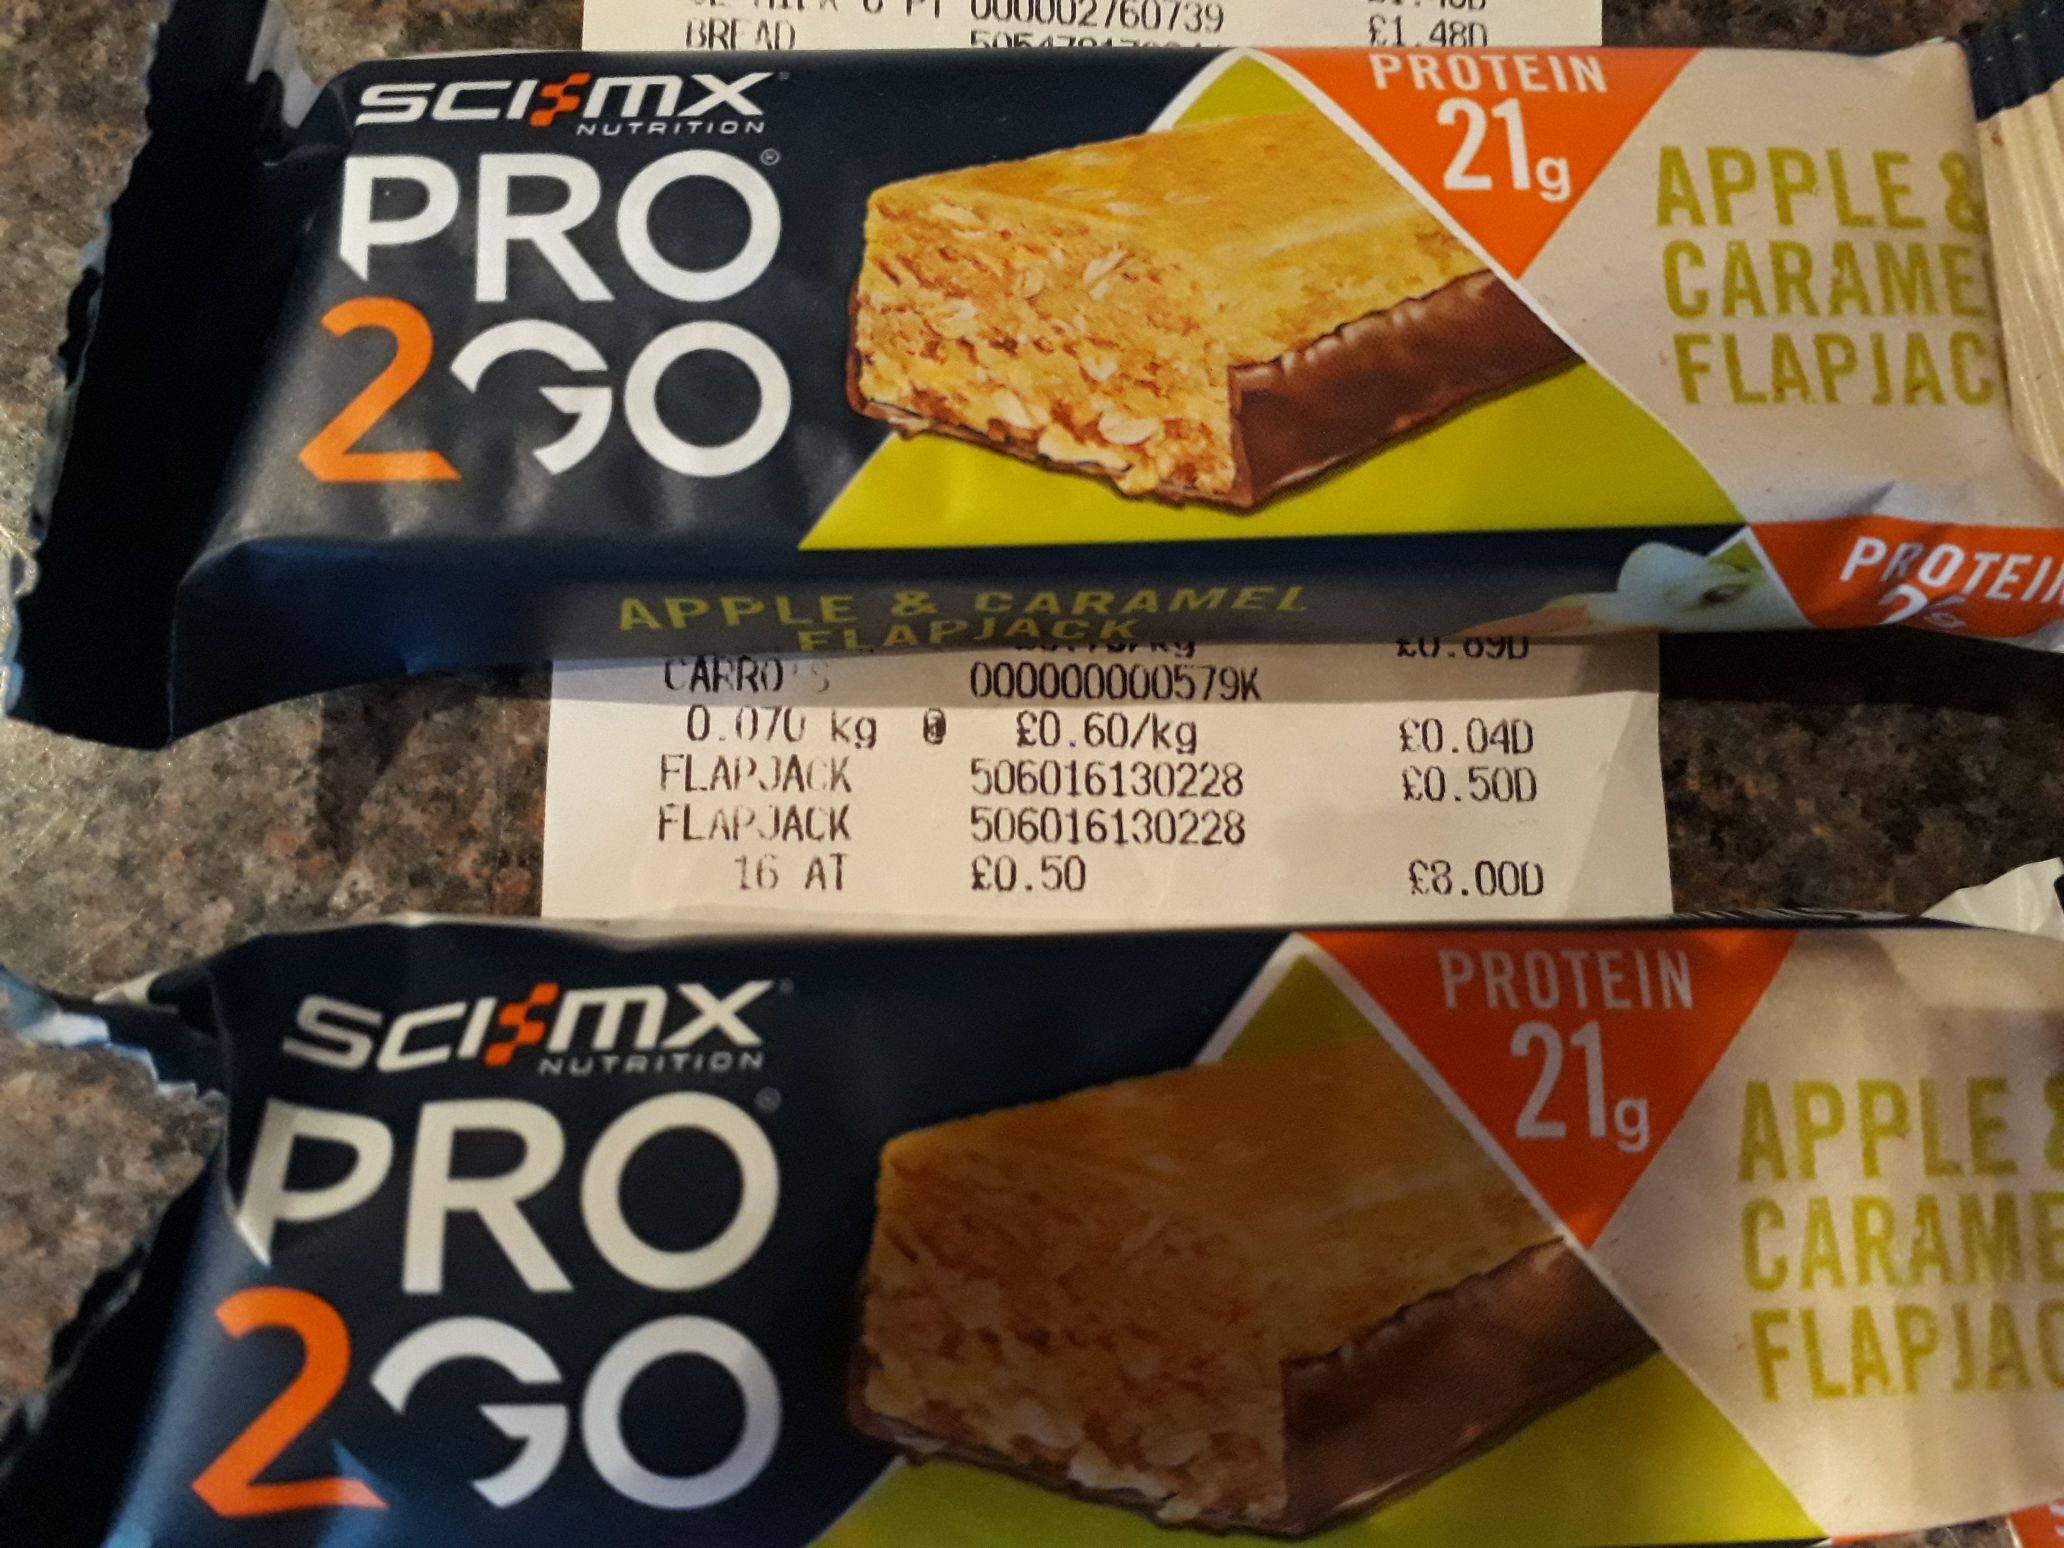 Sci mx pro2go protein flapjacks 50p instore @ asda